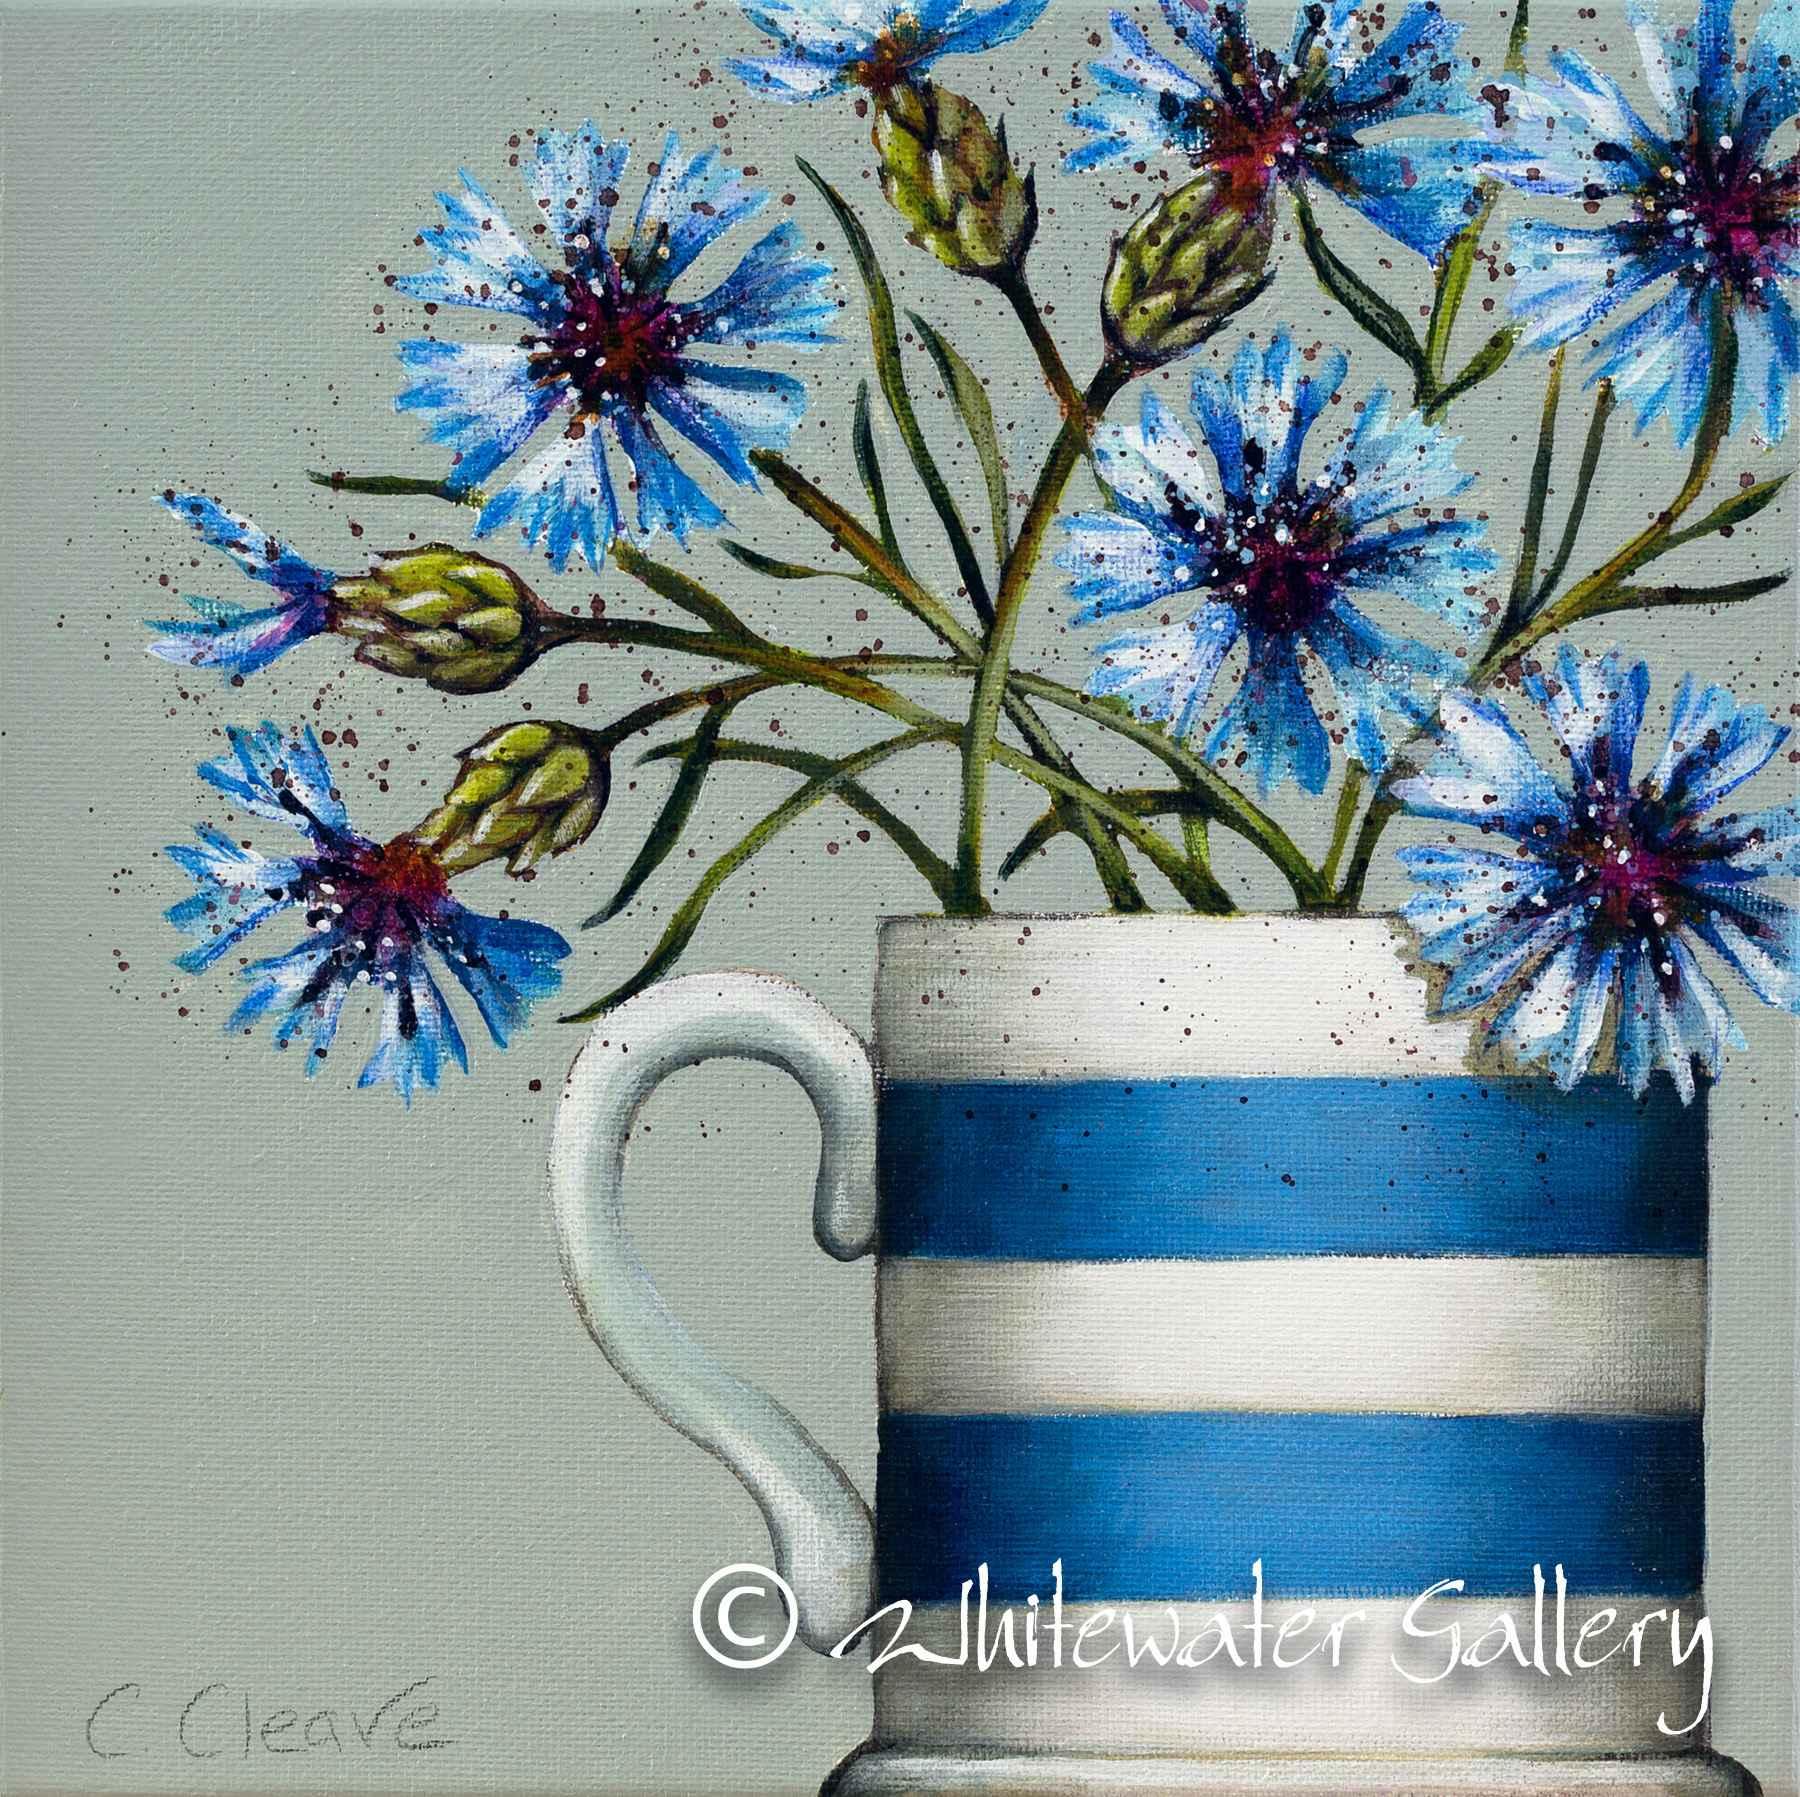 Cornish Cornflowers by  Caroline Cleave - Masterpiece Online